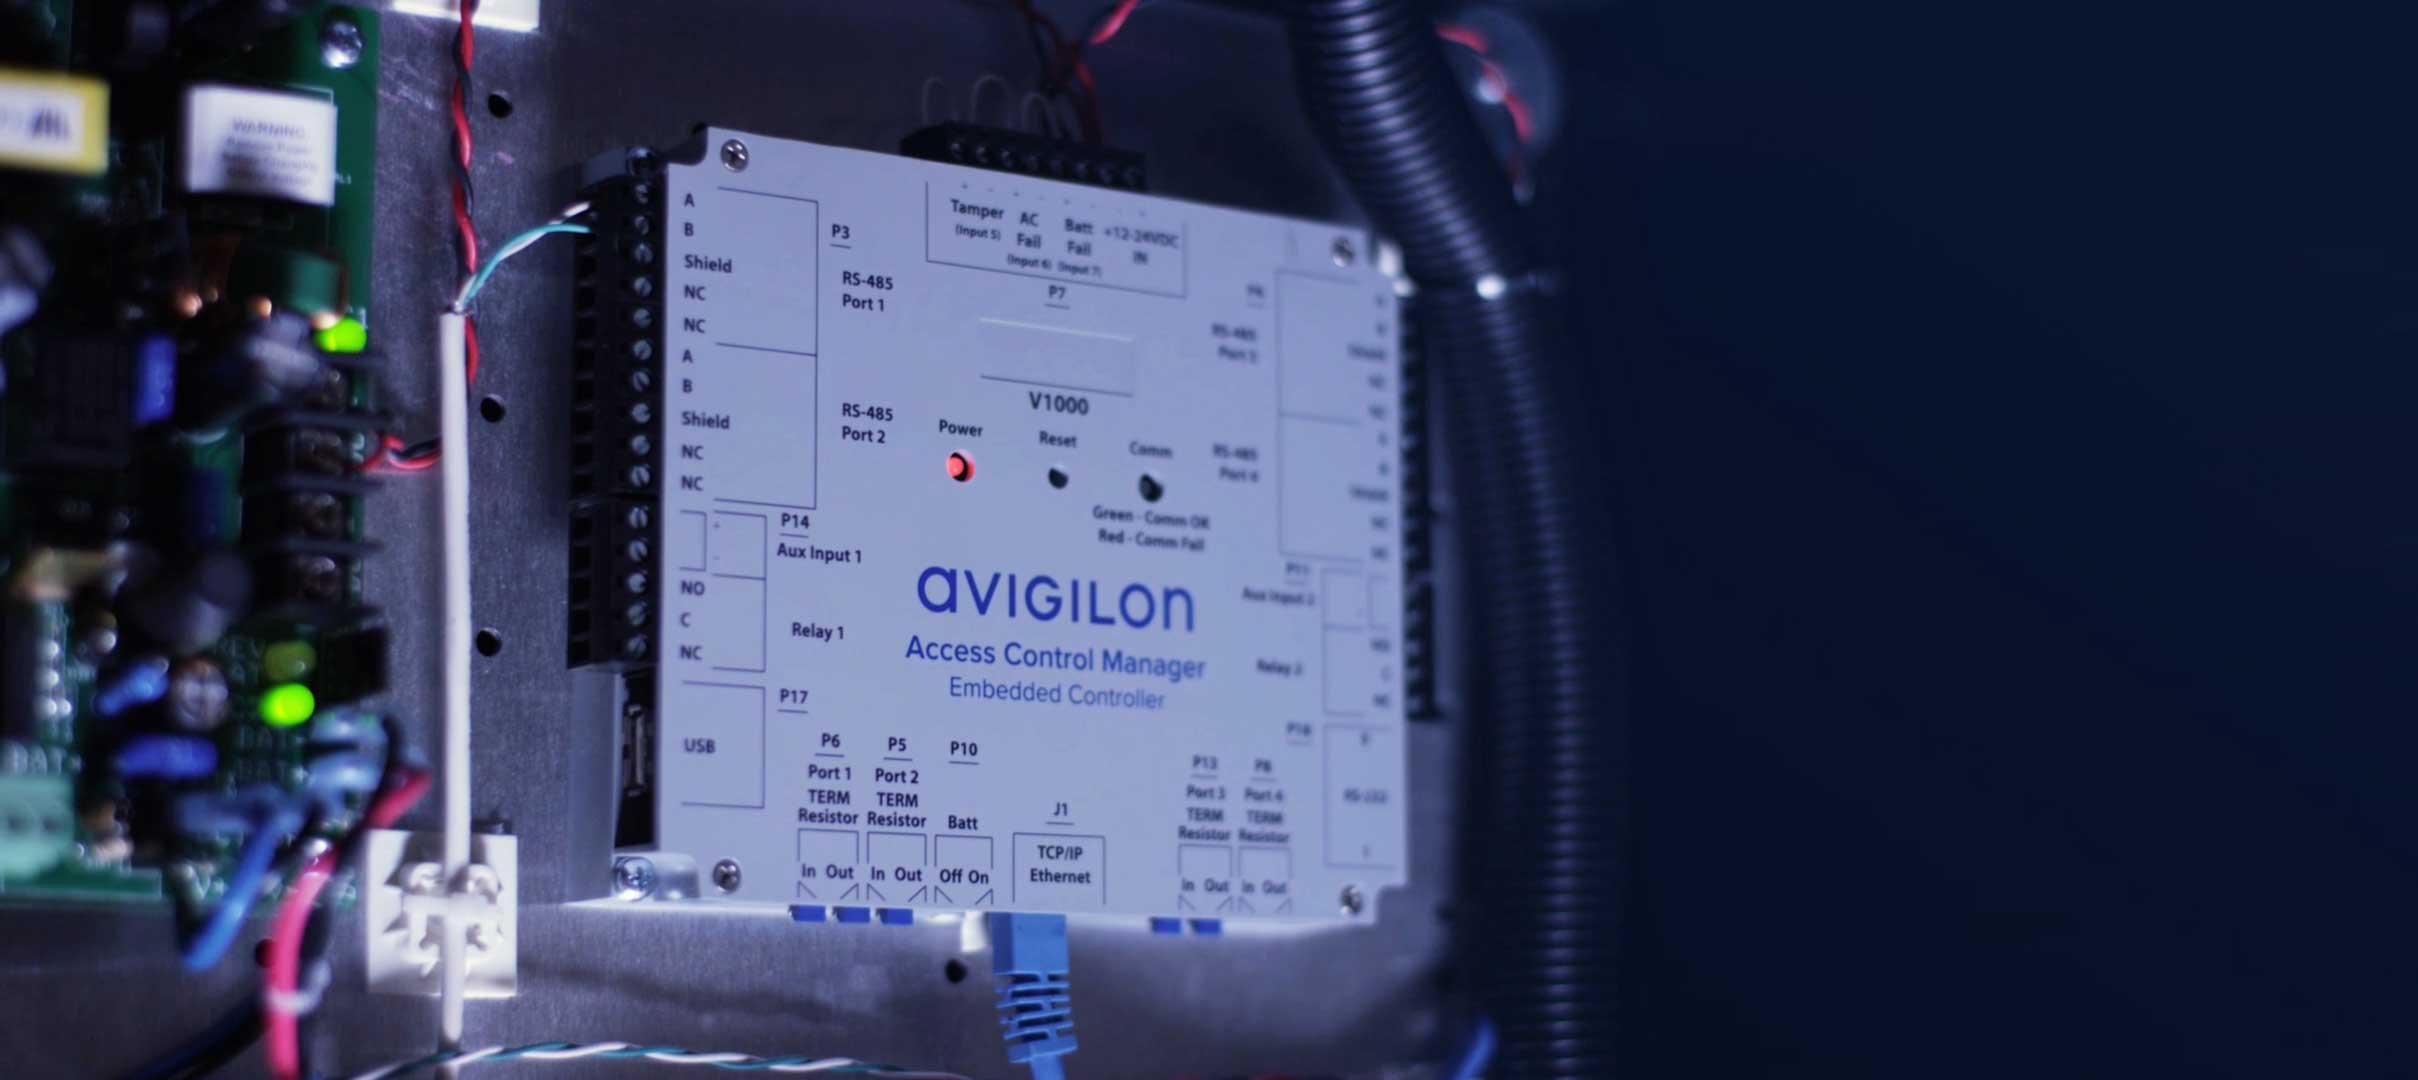 ACM Embedded Controller